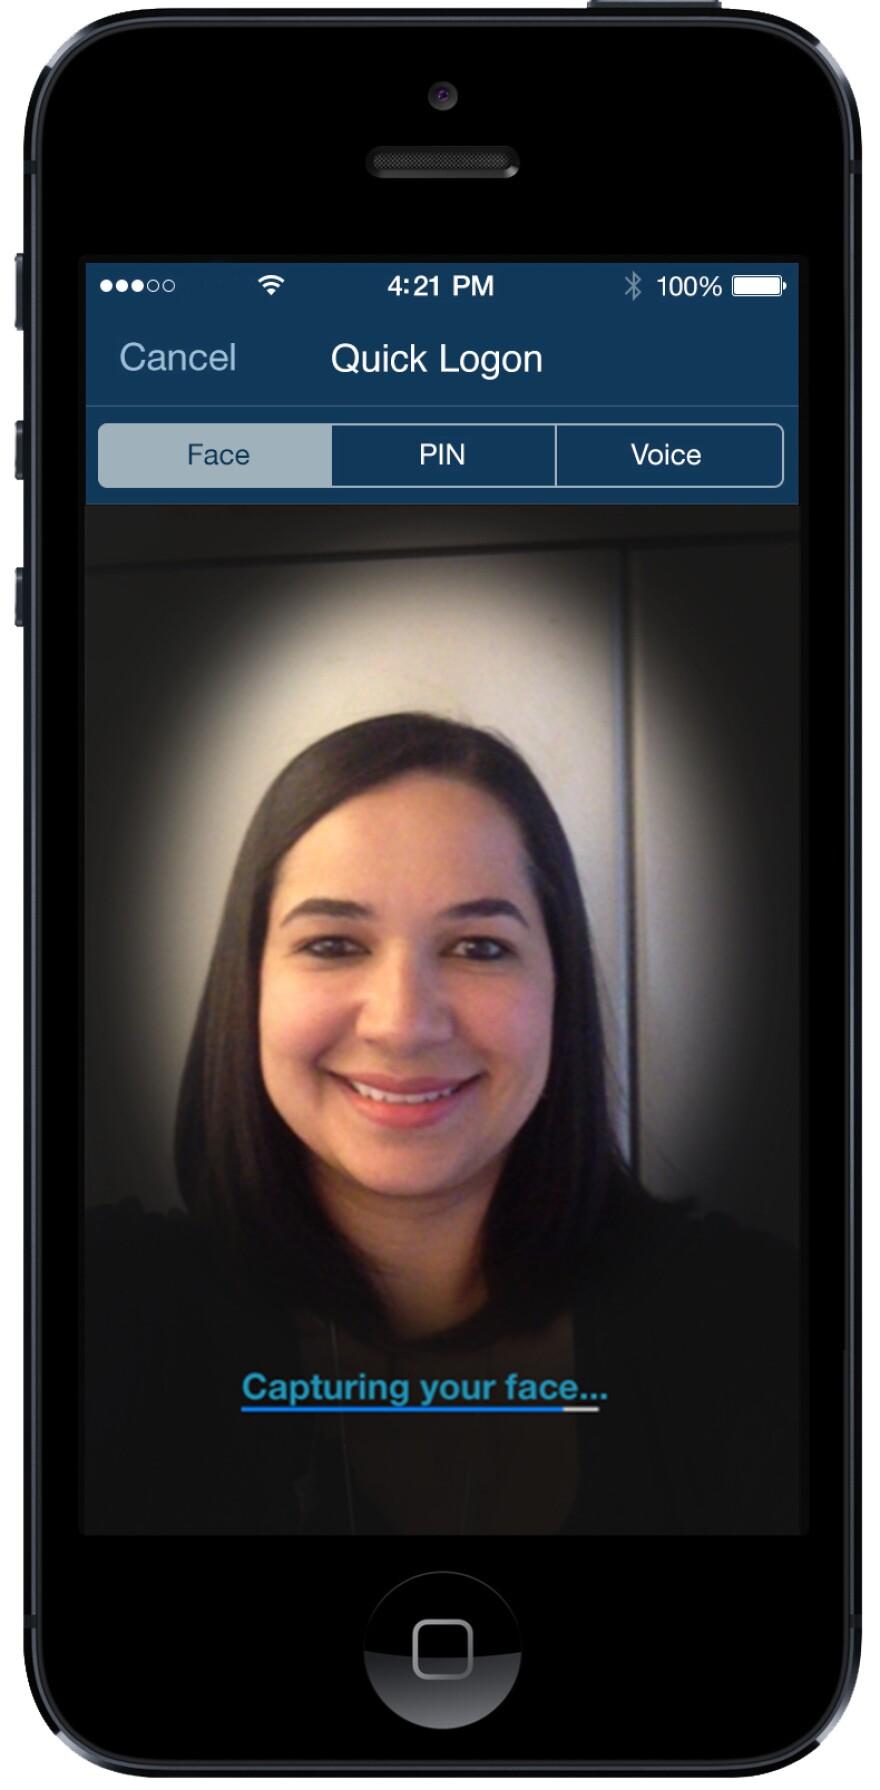 USAA uses biometrics to authenticate its account holders.